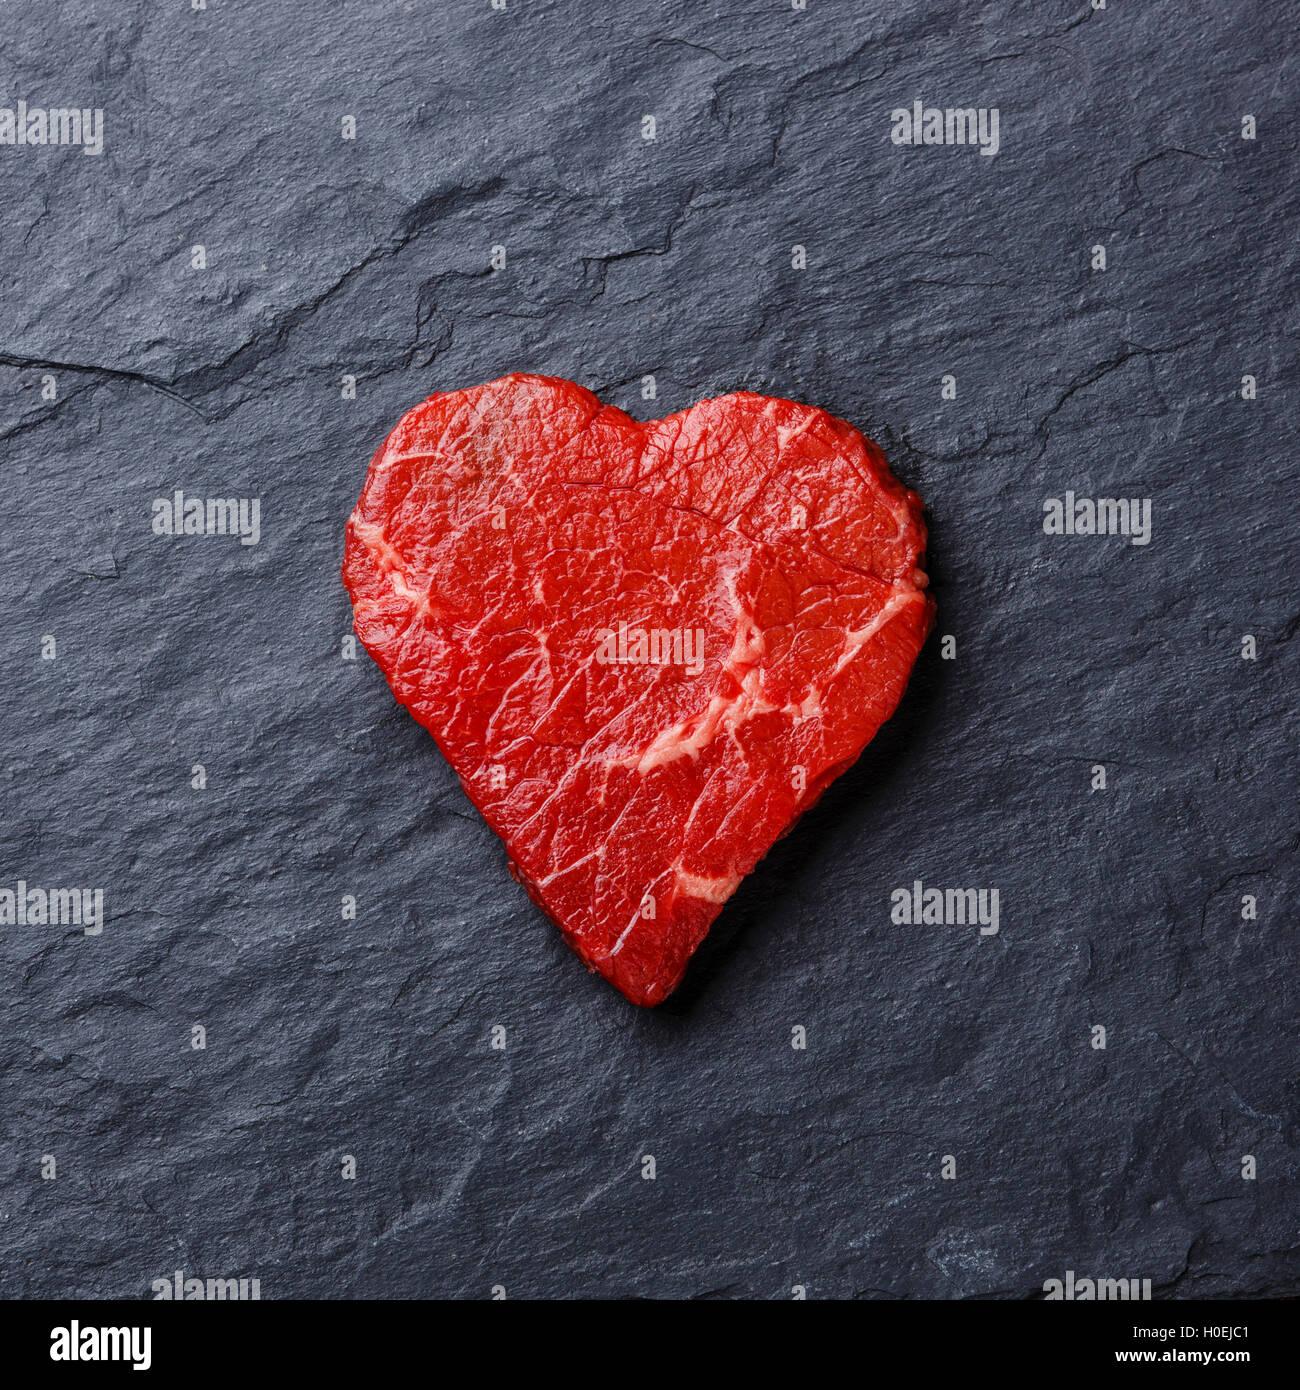 Carne fresca cruda forma de corazón sobre fondo de pizarra de piedra oscura Imagen De Stock